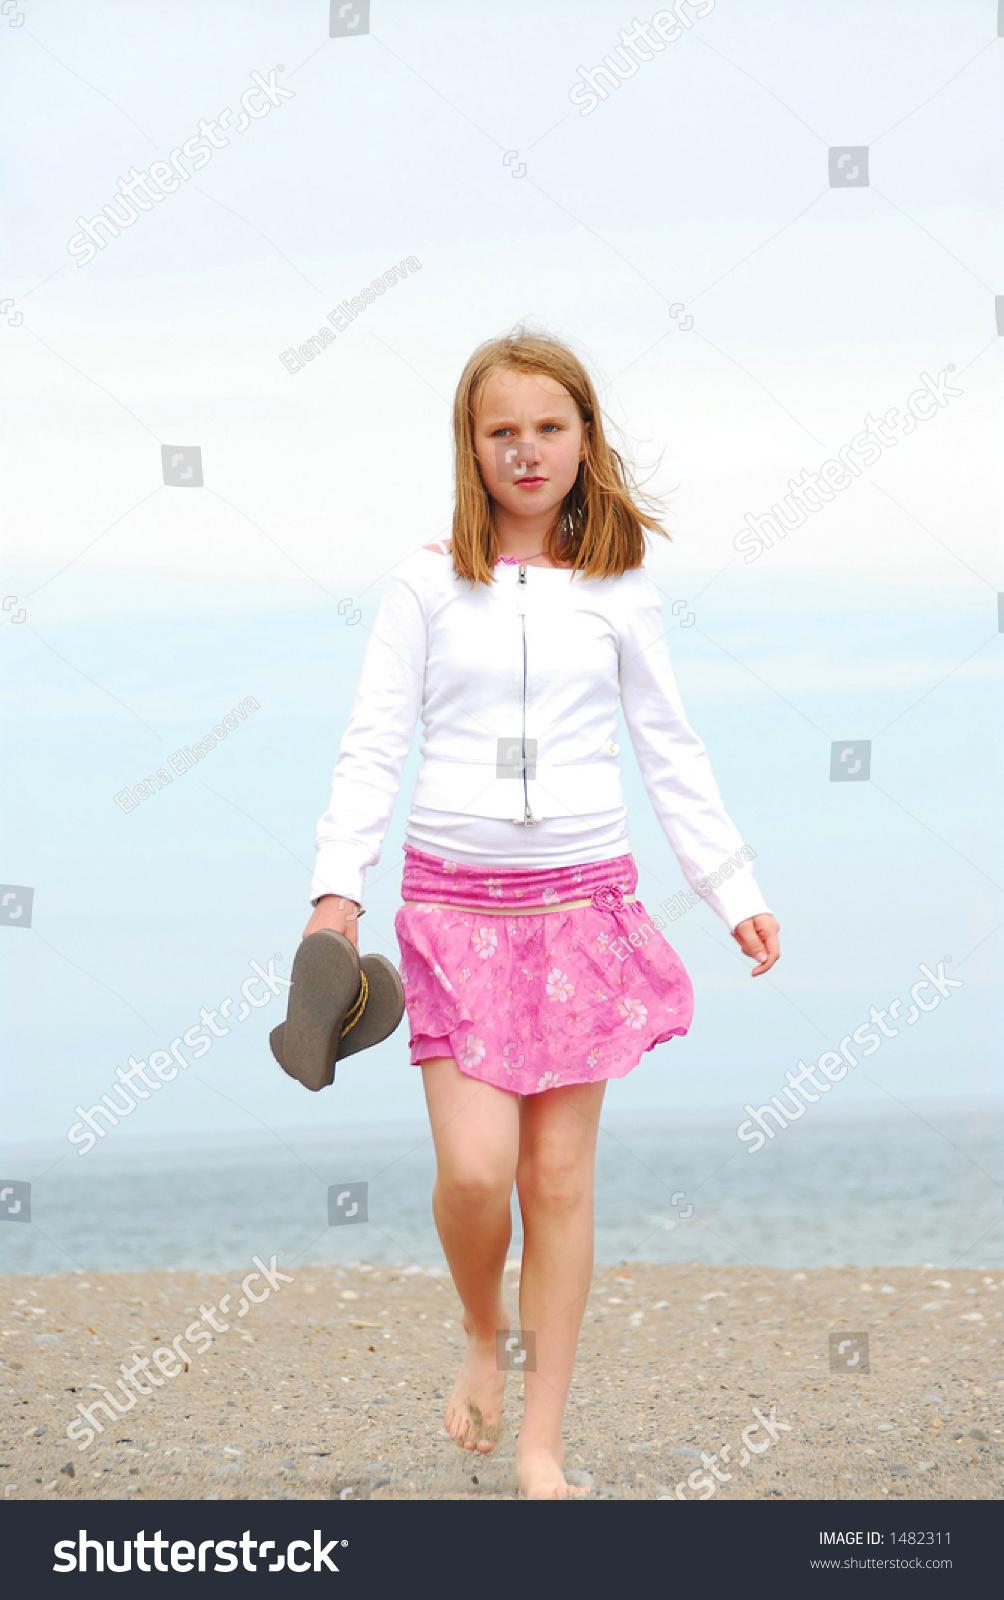 Young Pre Teen Girl Female Woman Torso Vertical Format: Young Preteen Girl Walking On A Sandy Beach Stock Photo